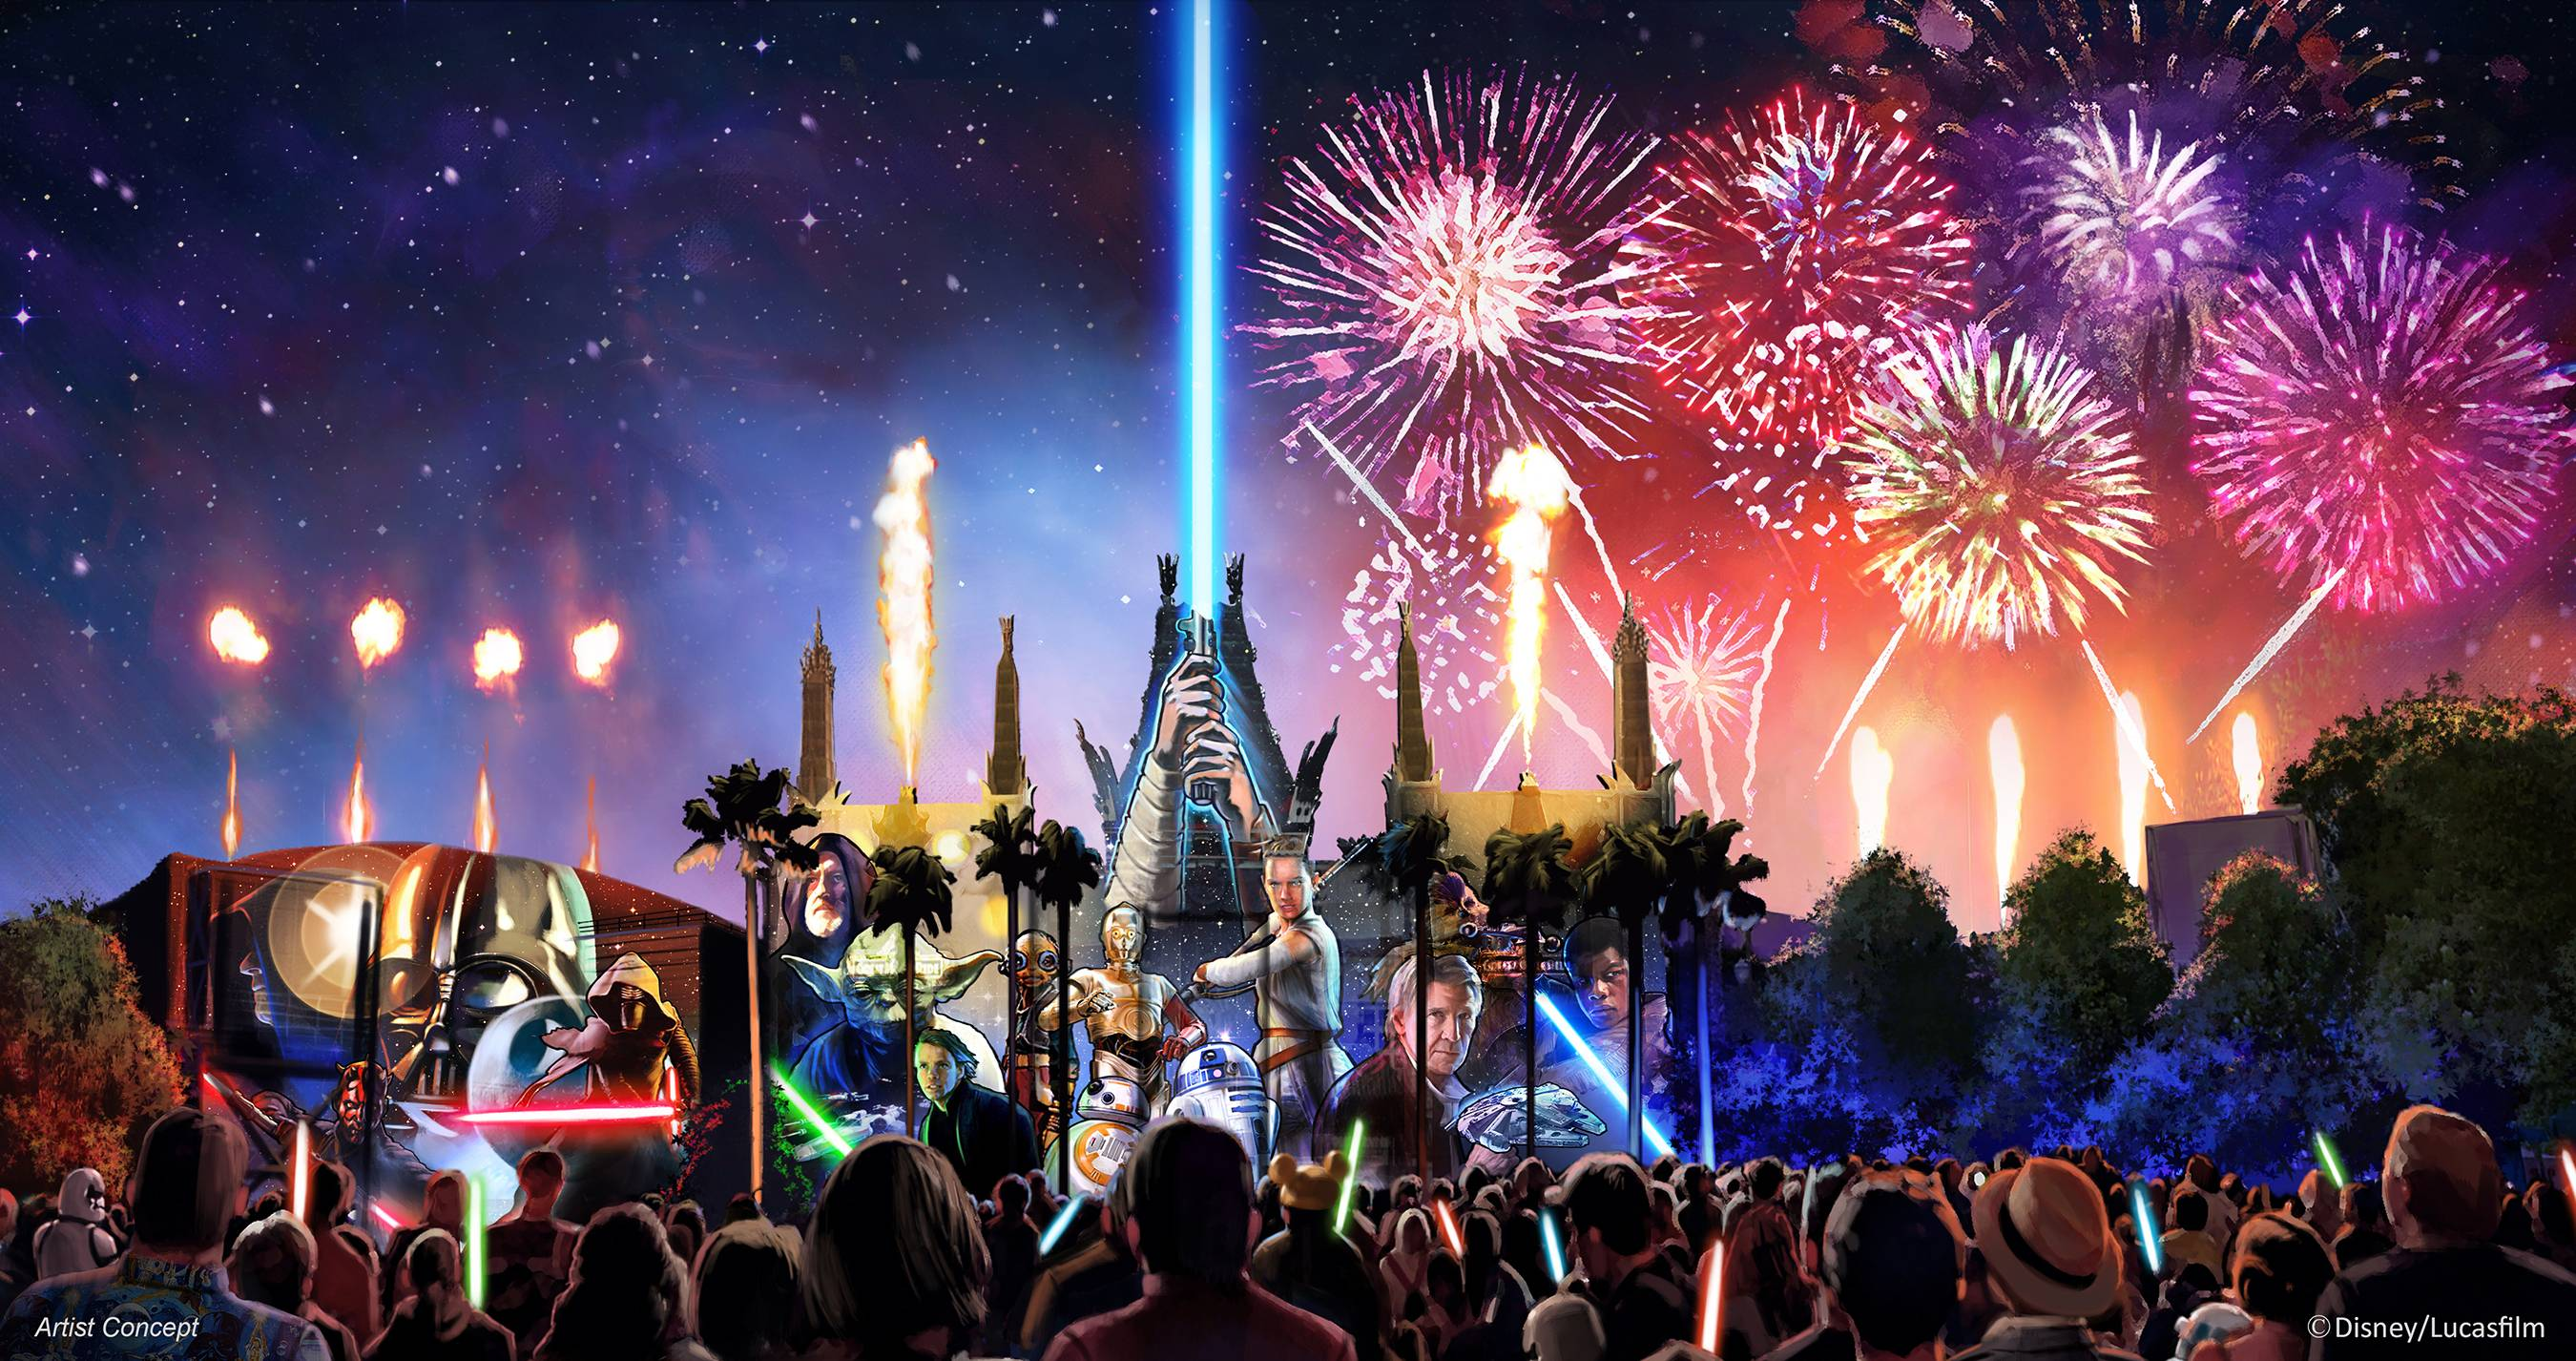 Star Wars A Galactic Spectacular firework show concept art